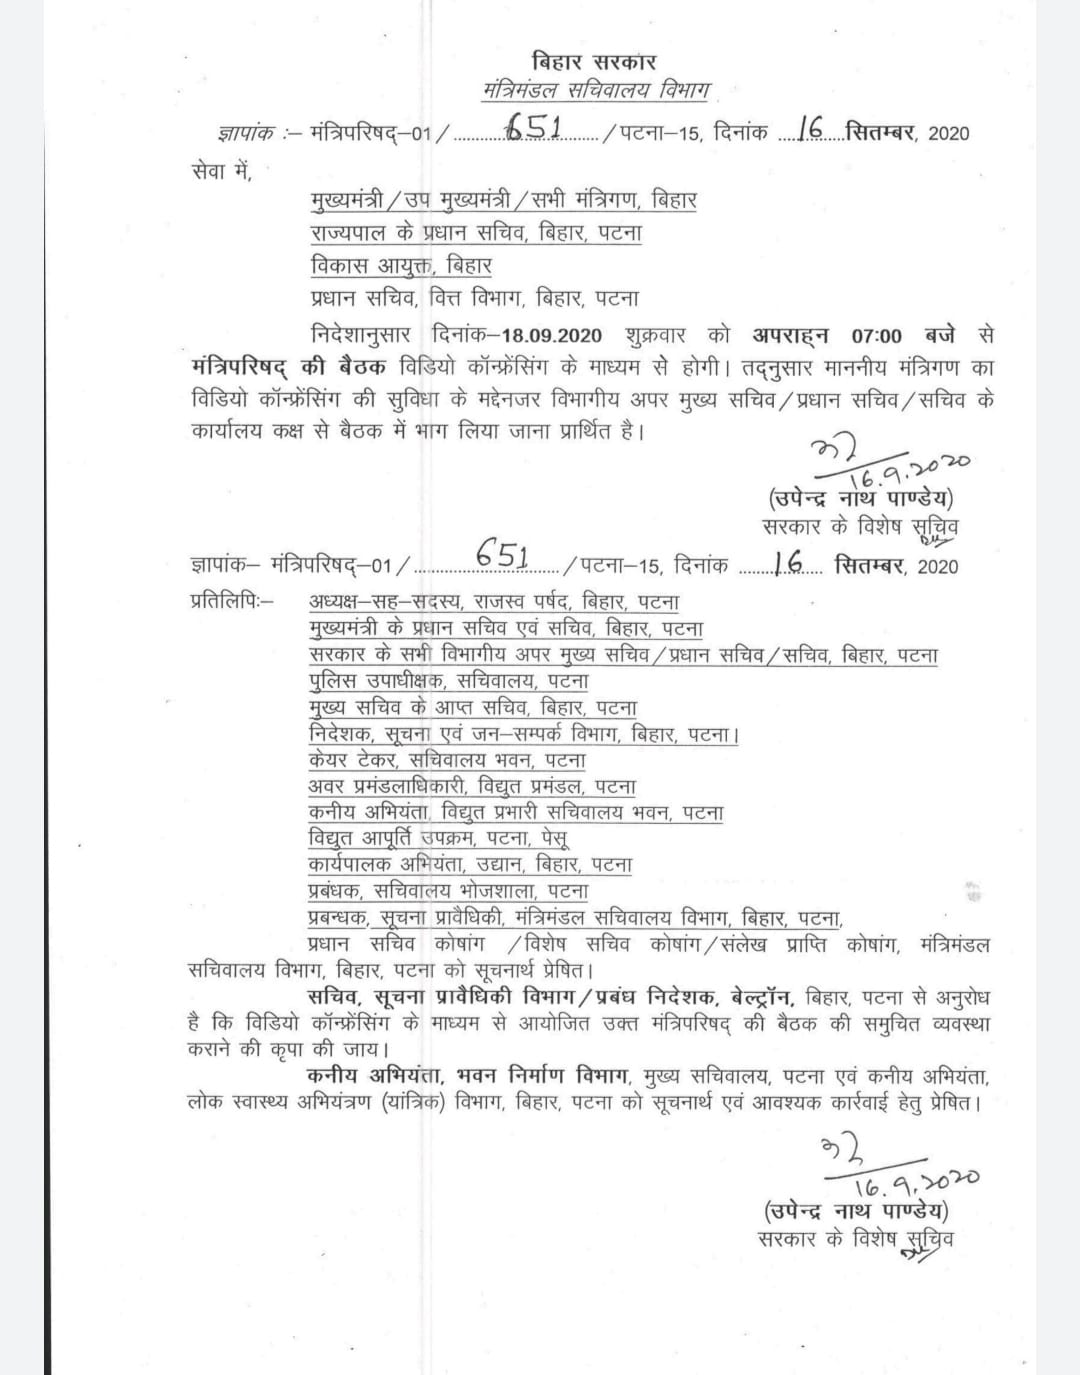 Bihar News Update